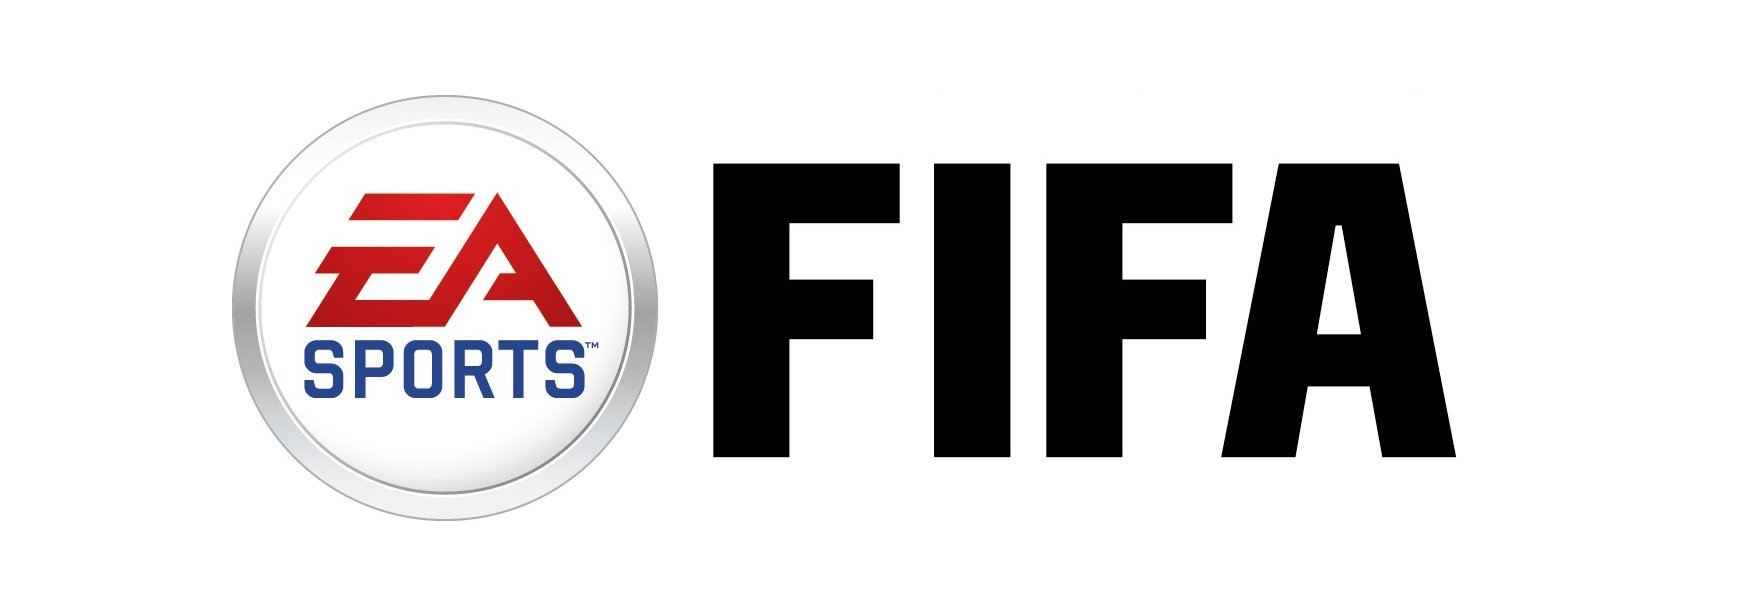 Fifa HD 1080 Wallpaper